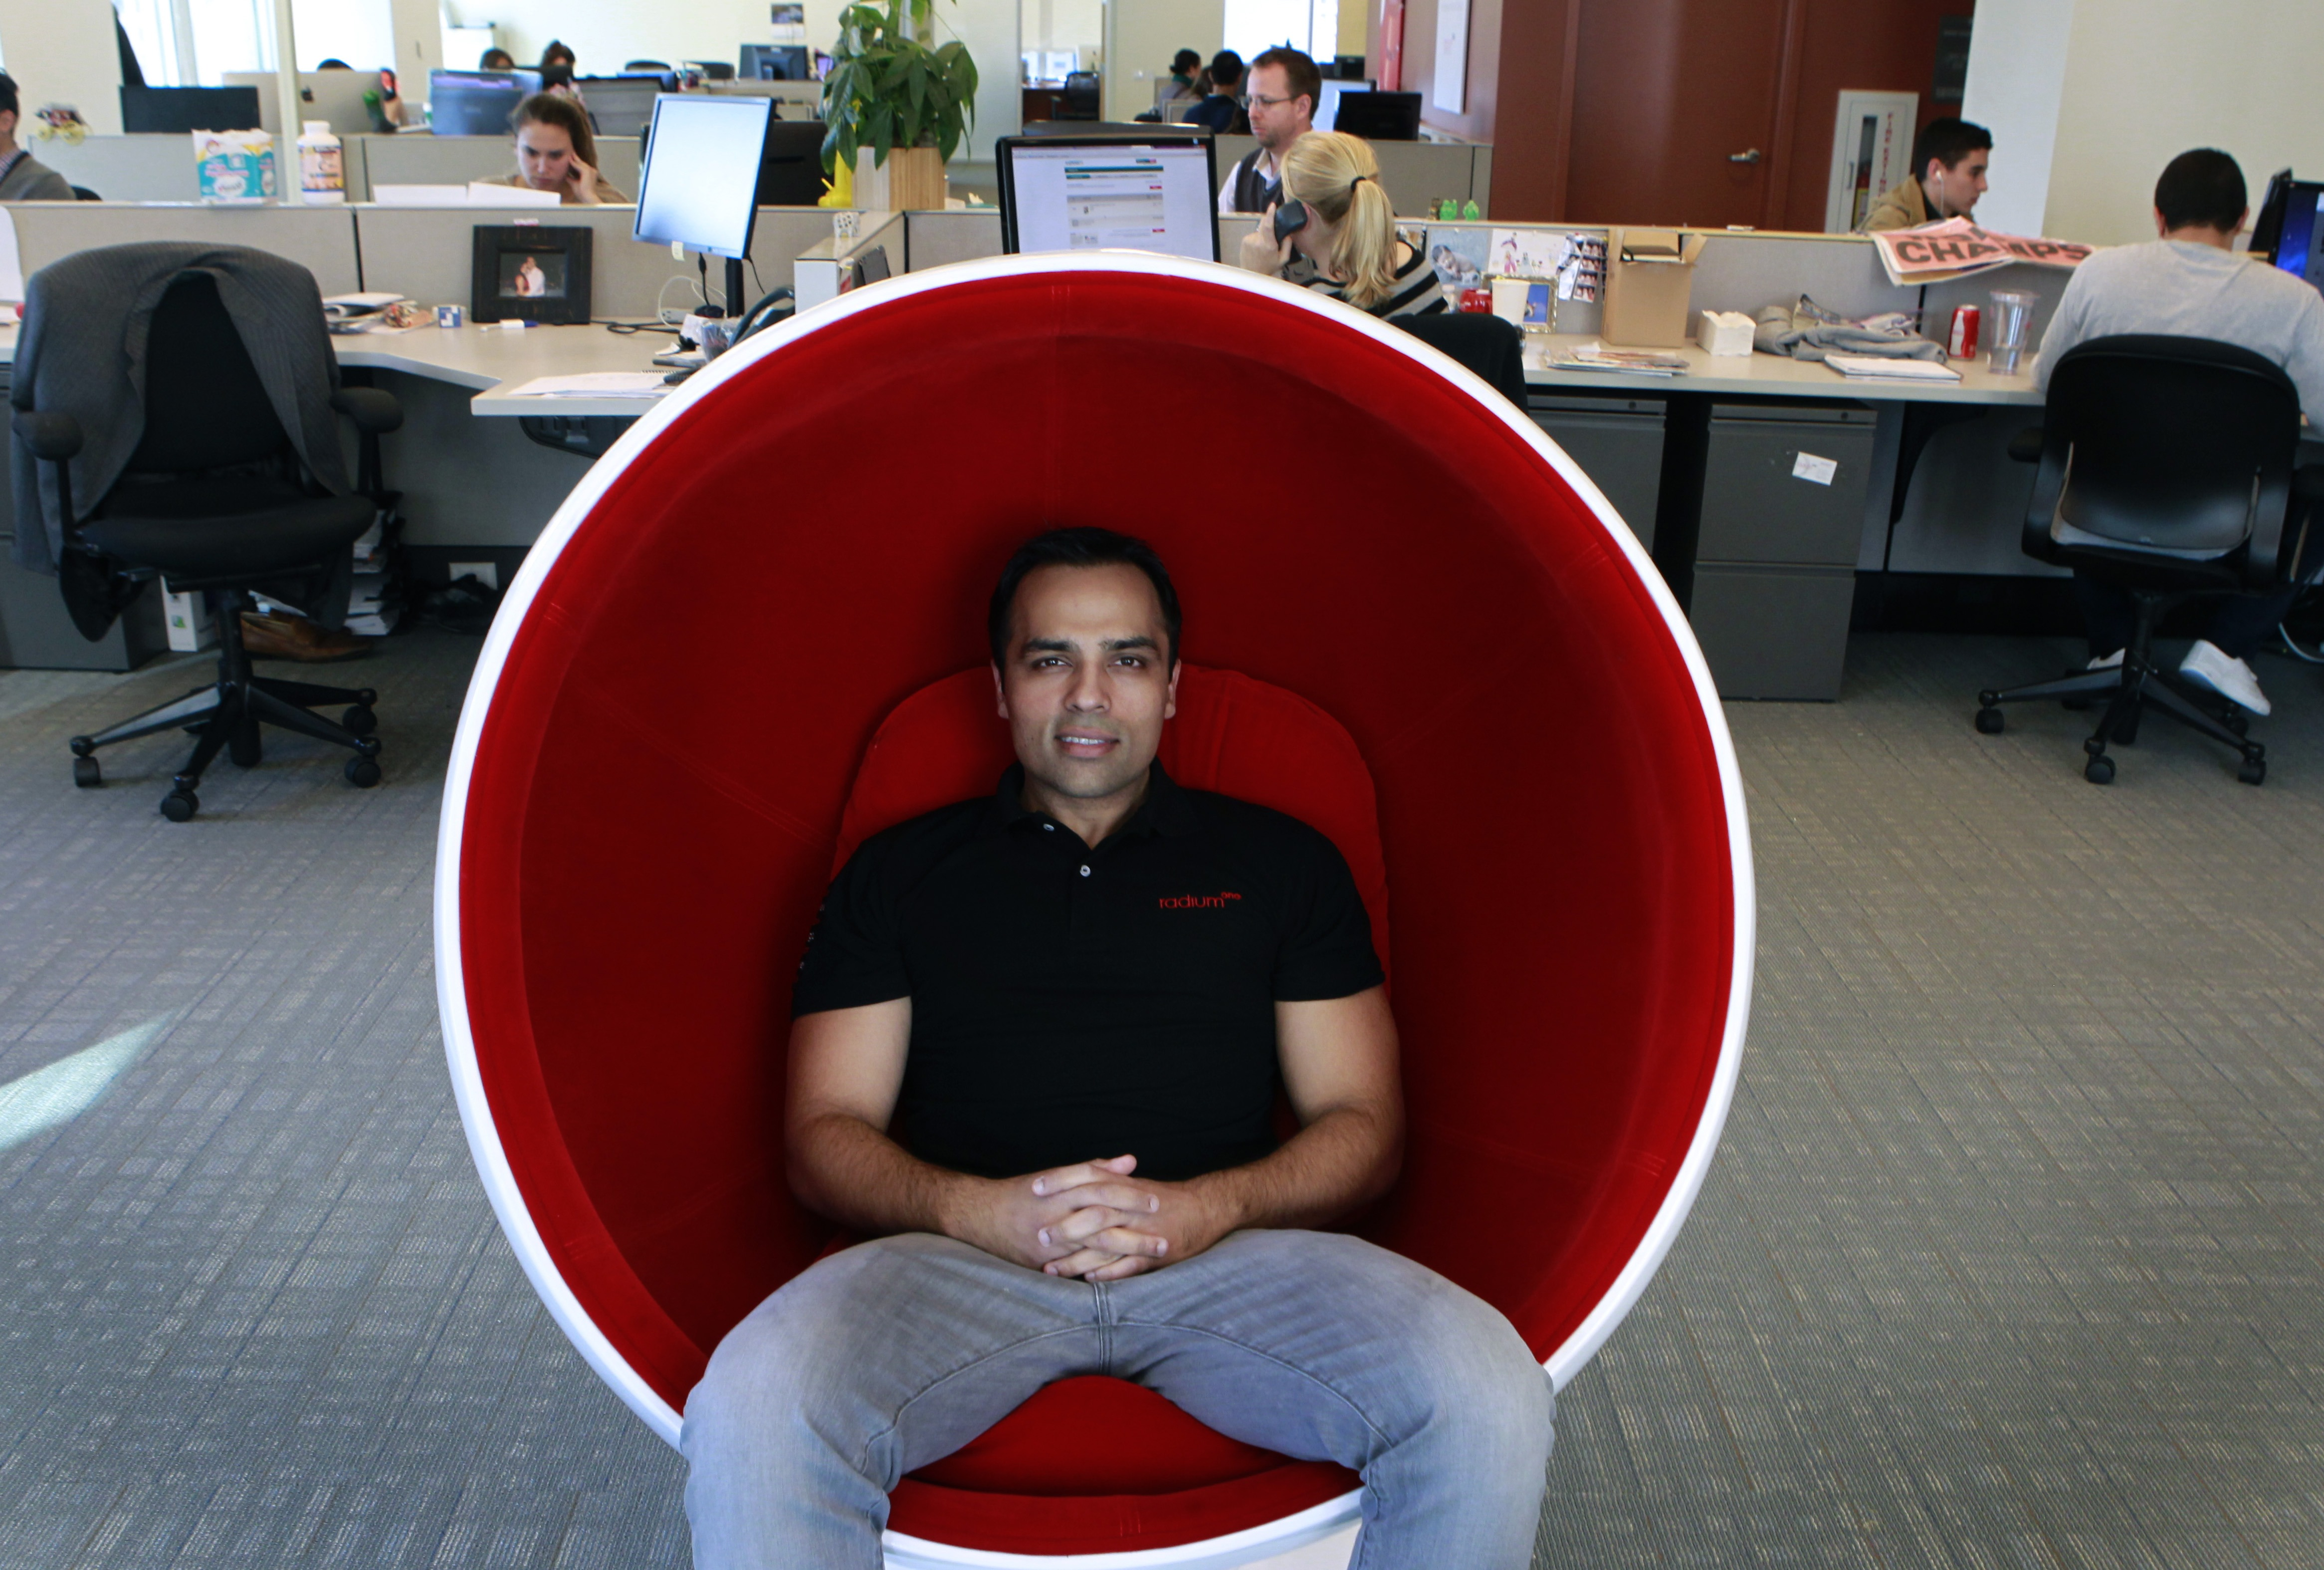 USA - Internet entrepeneur Gurbaksh Chahal